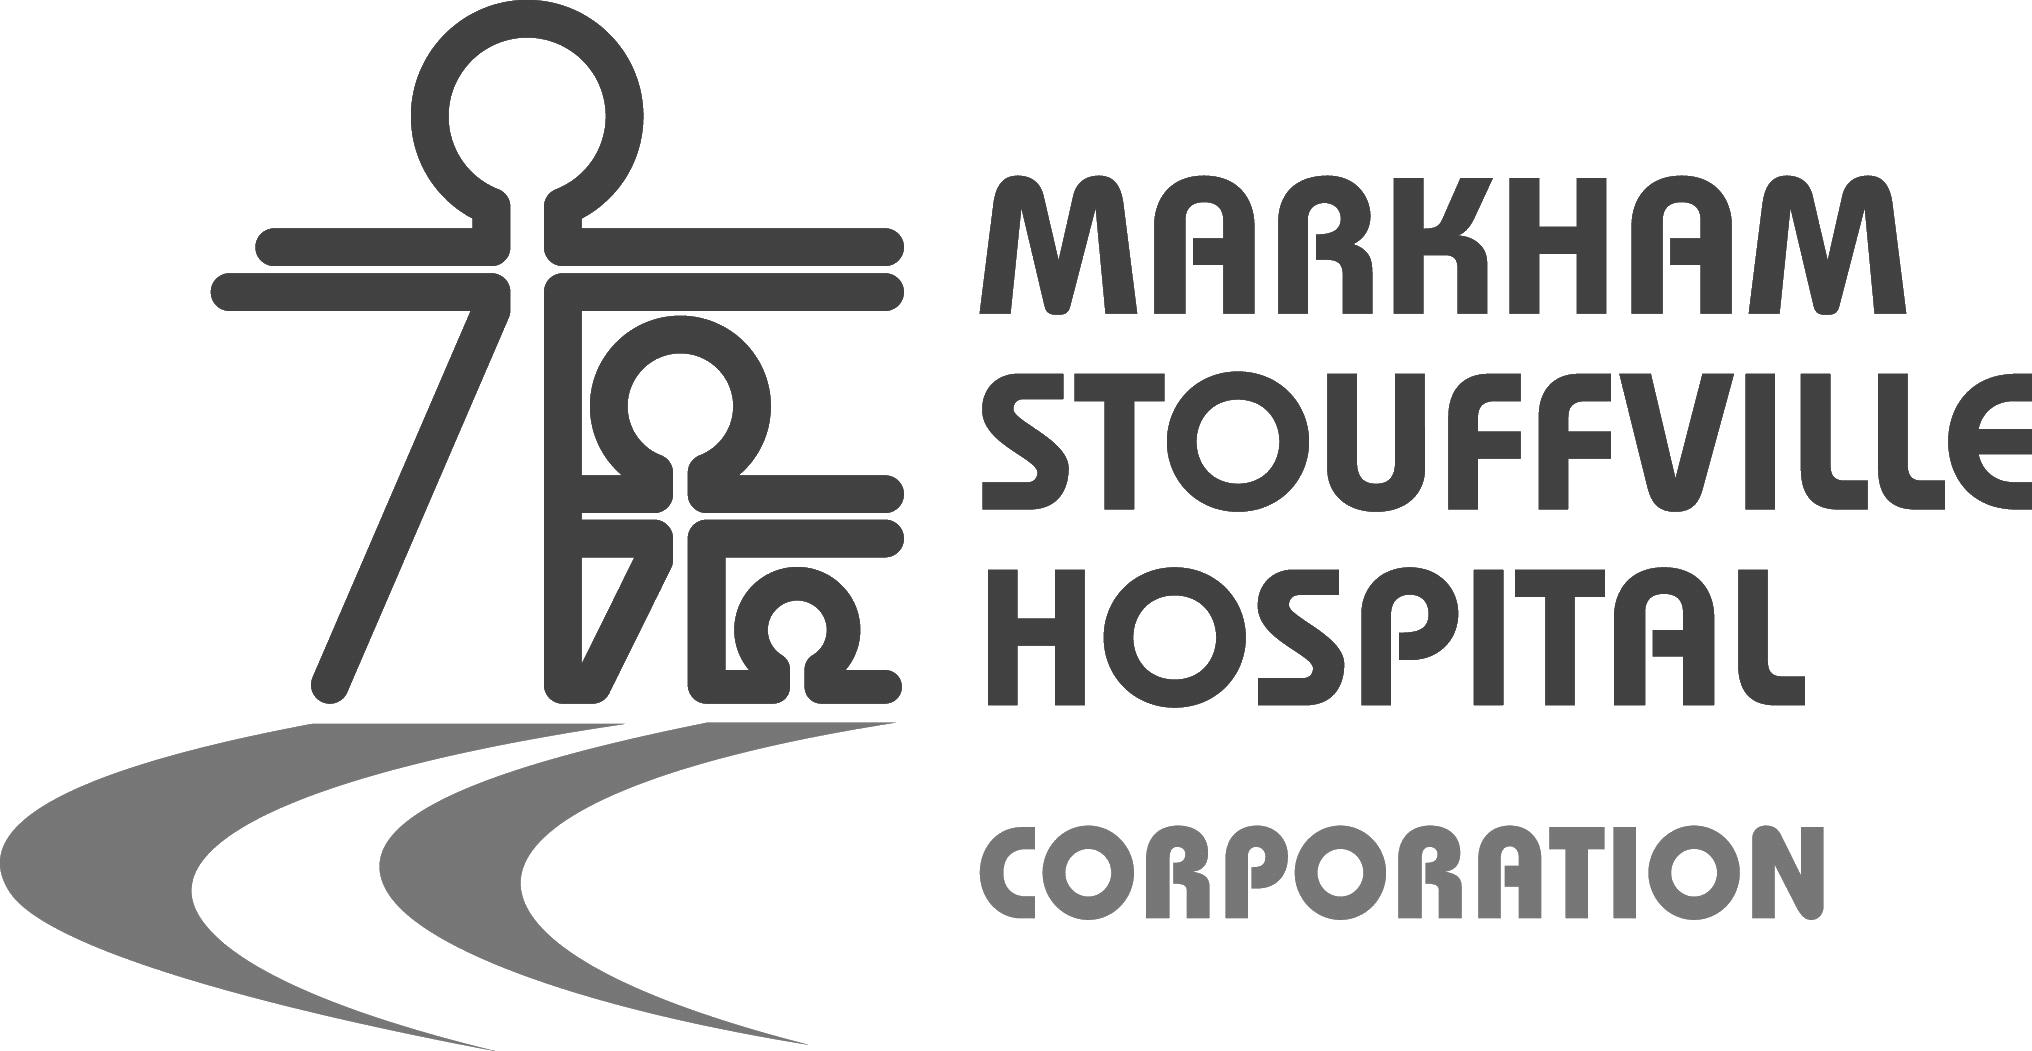 Spectrum: Local Antimicrobial Stewardship, for Markham Stouffville Hospital